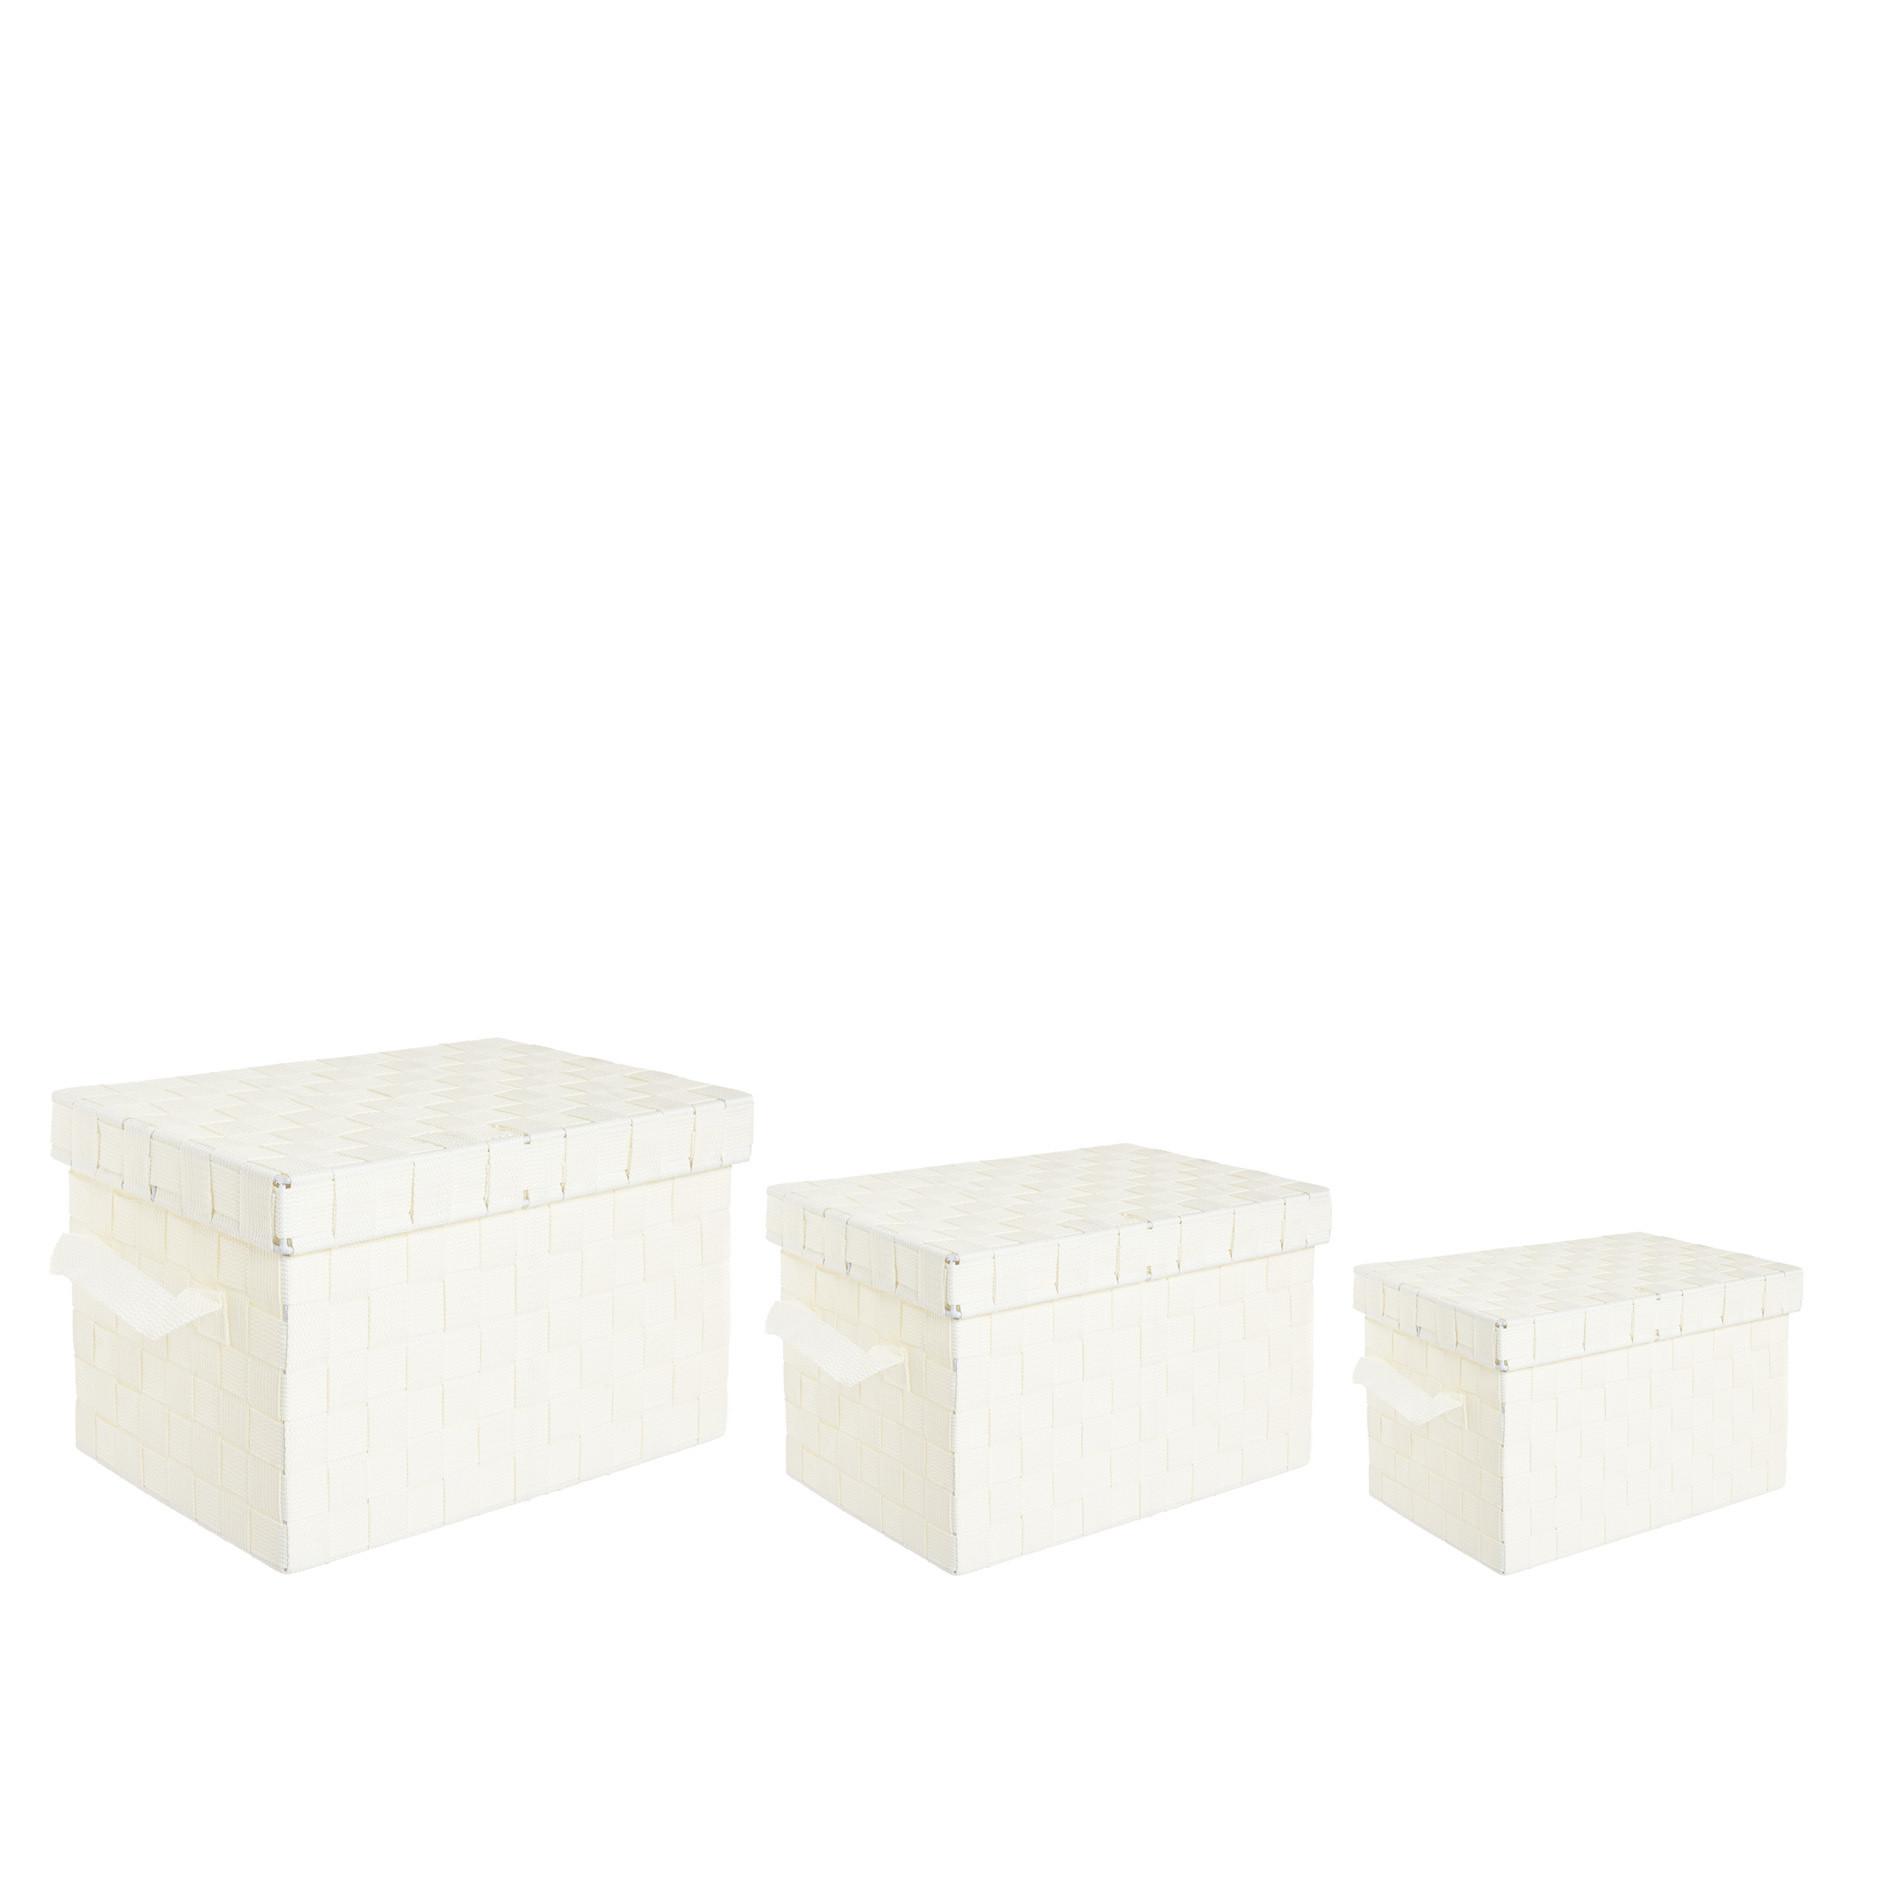 Storage box a nastri intrecciati, Bianco, large image number 2